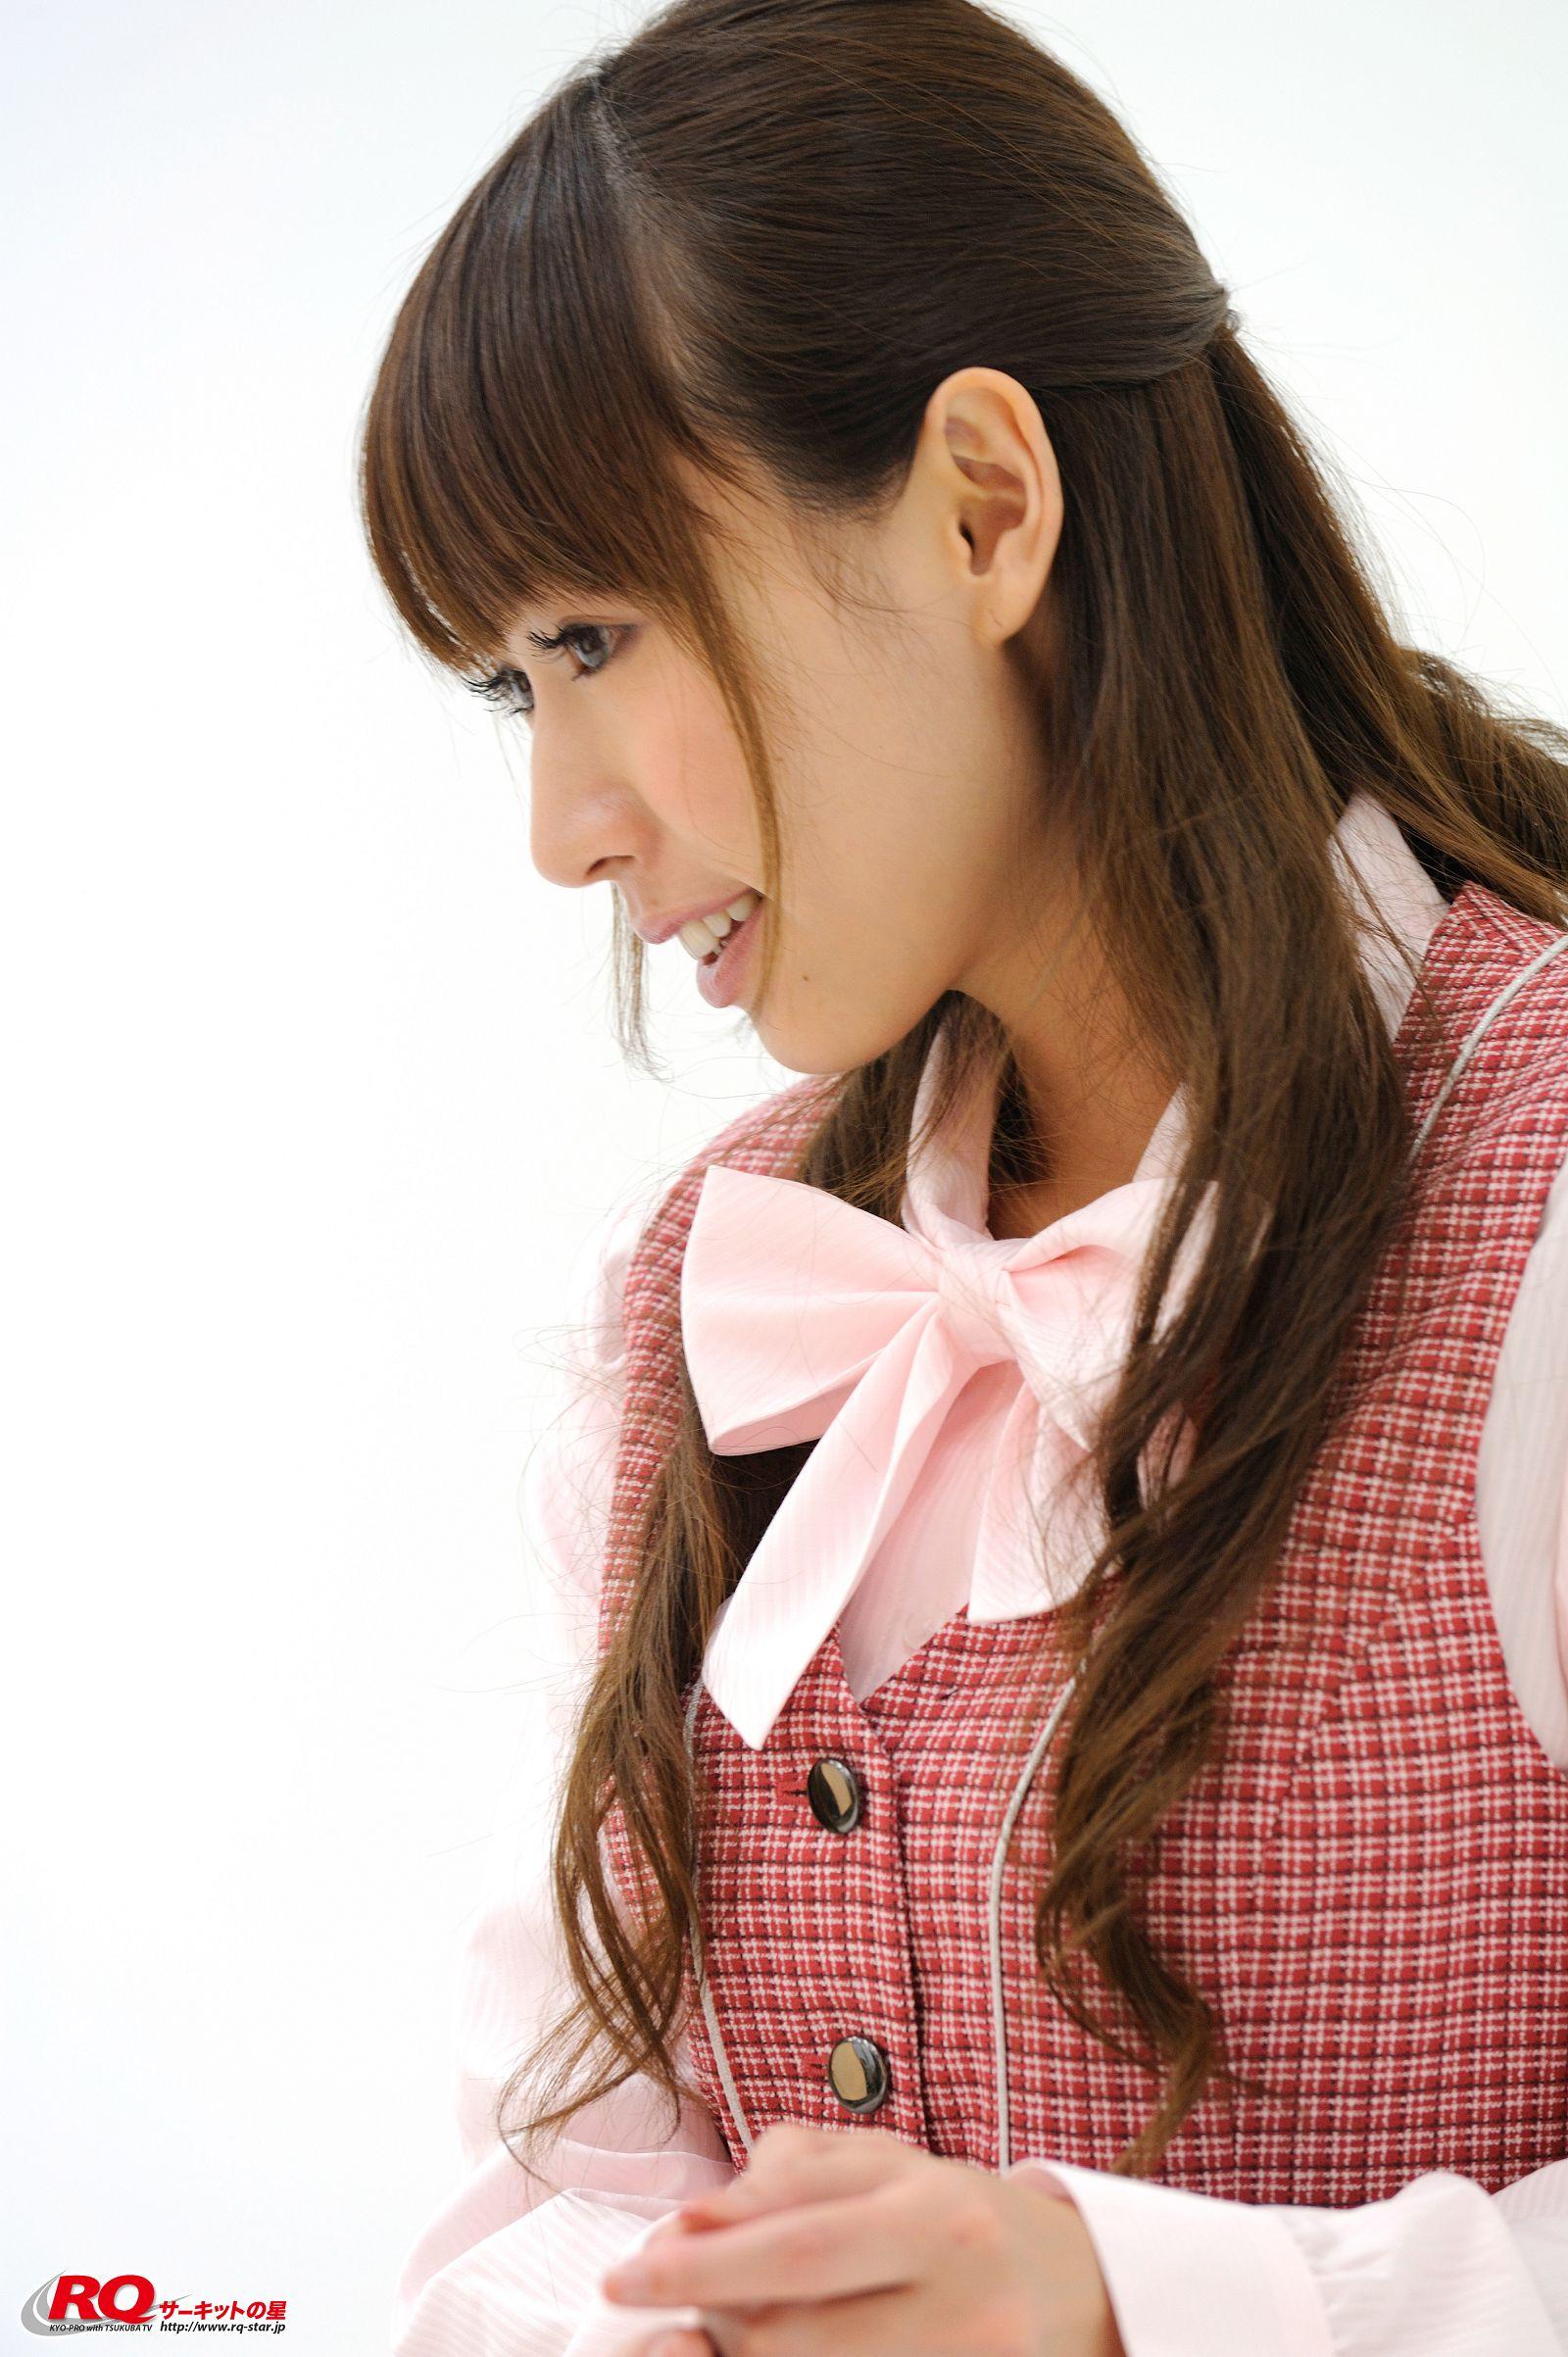 [RQ STAR美女] NO.0114 Rina Yamamoto 山本里奈 Office Lady[68P] RQ STAR 第4张